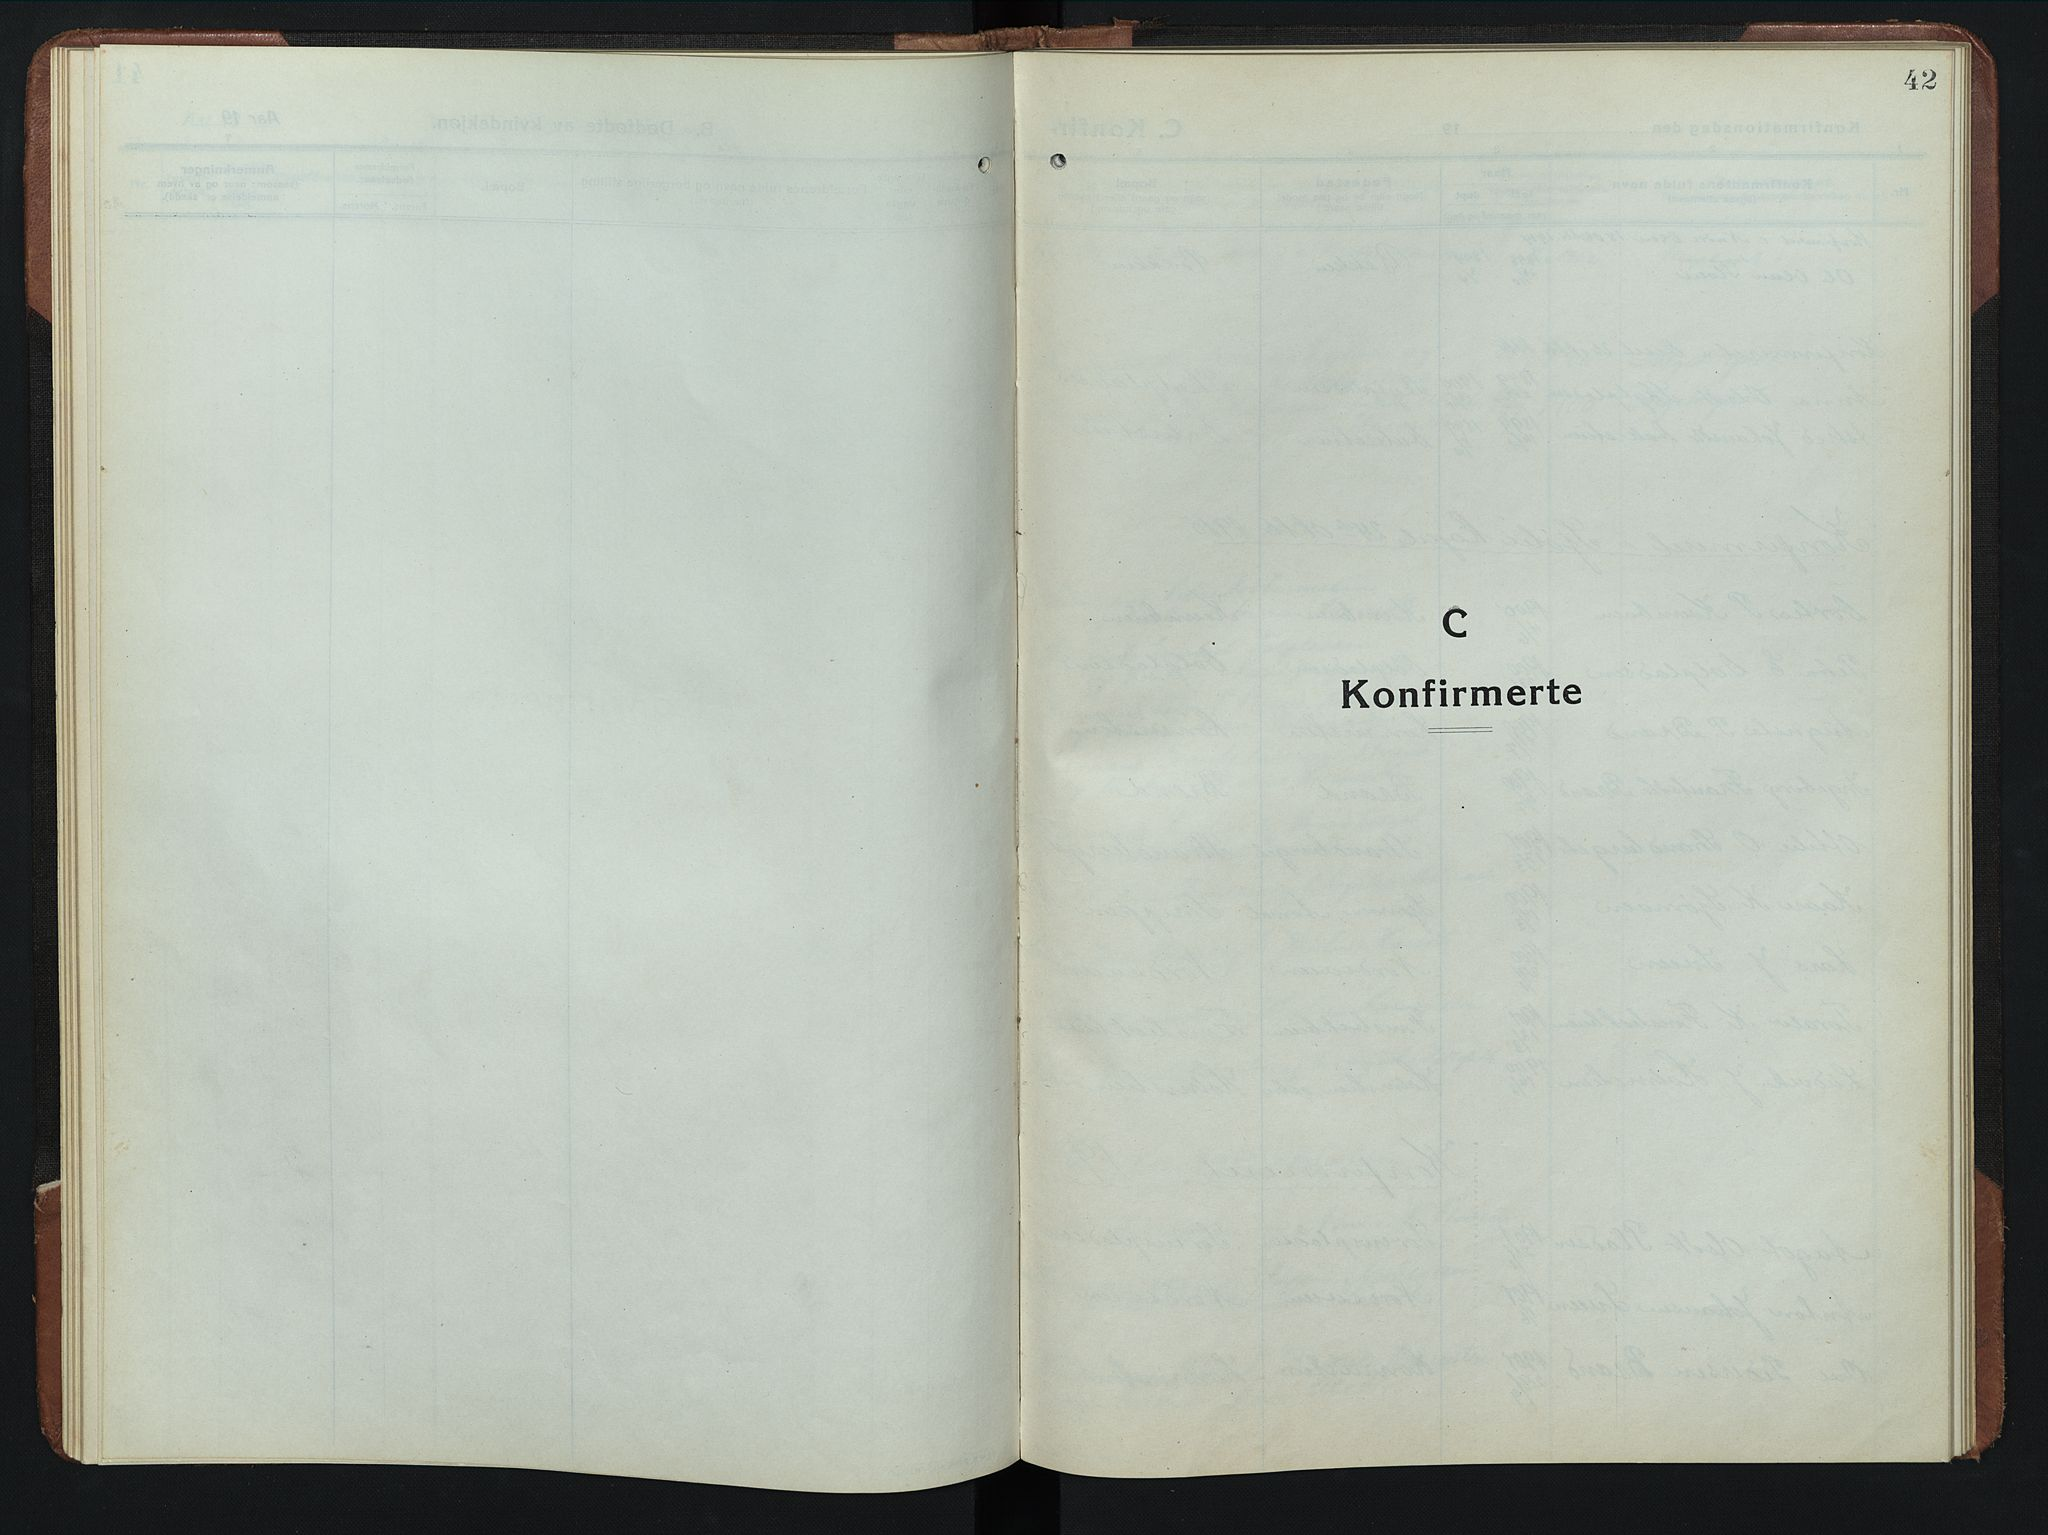 SAH, Rendalen prestekontor, H/Ha/Hab/L0008: Parish register (copy) no. 8, 1914-1948, p. 42